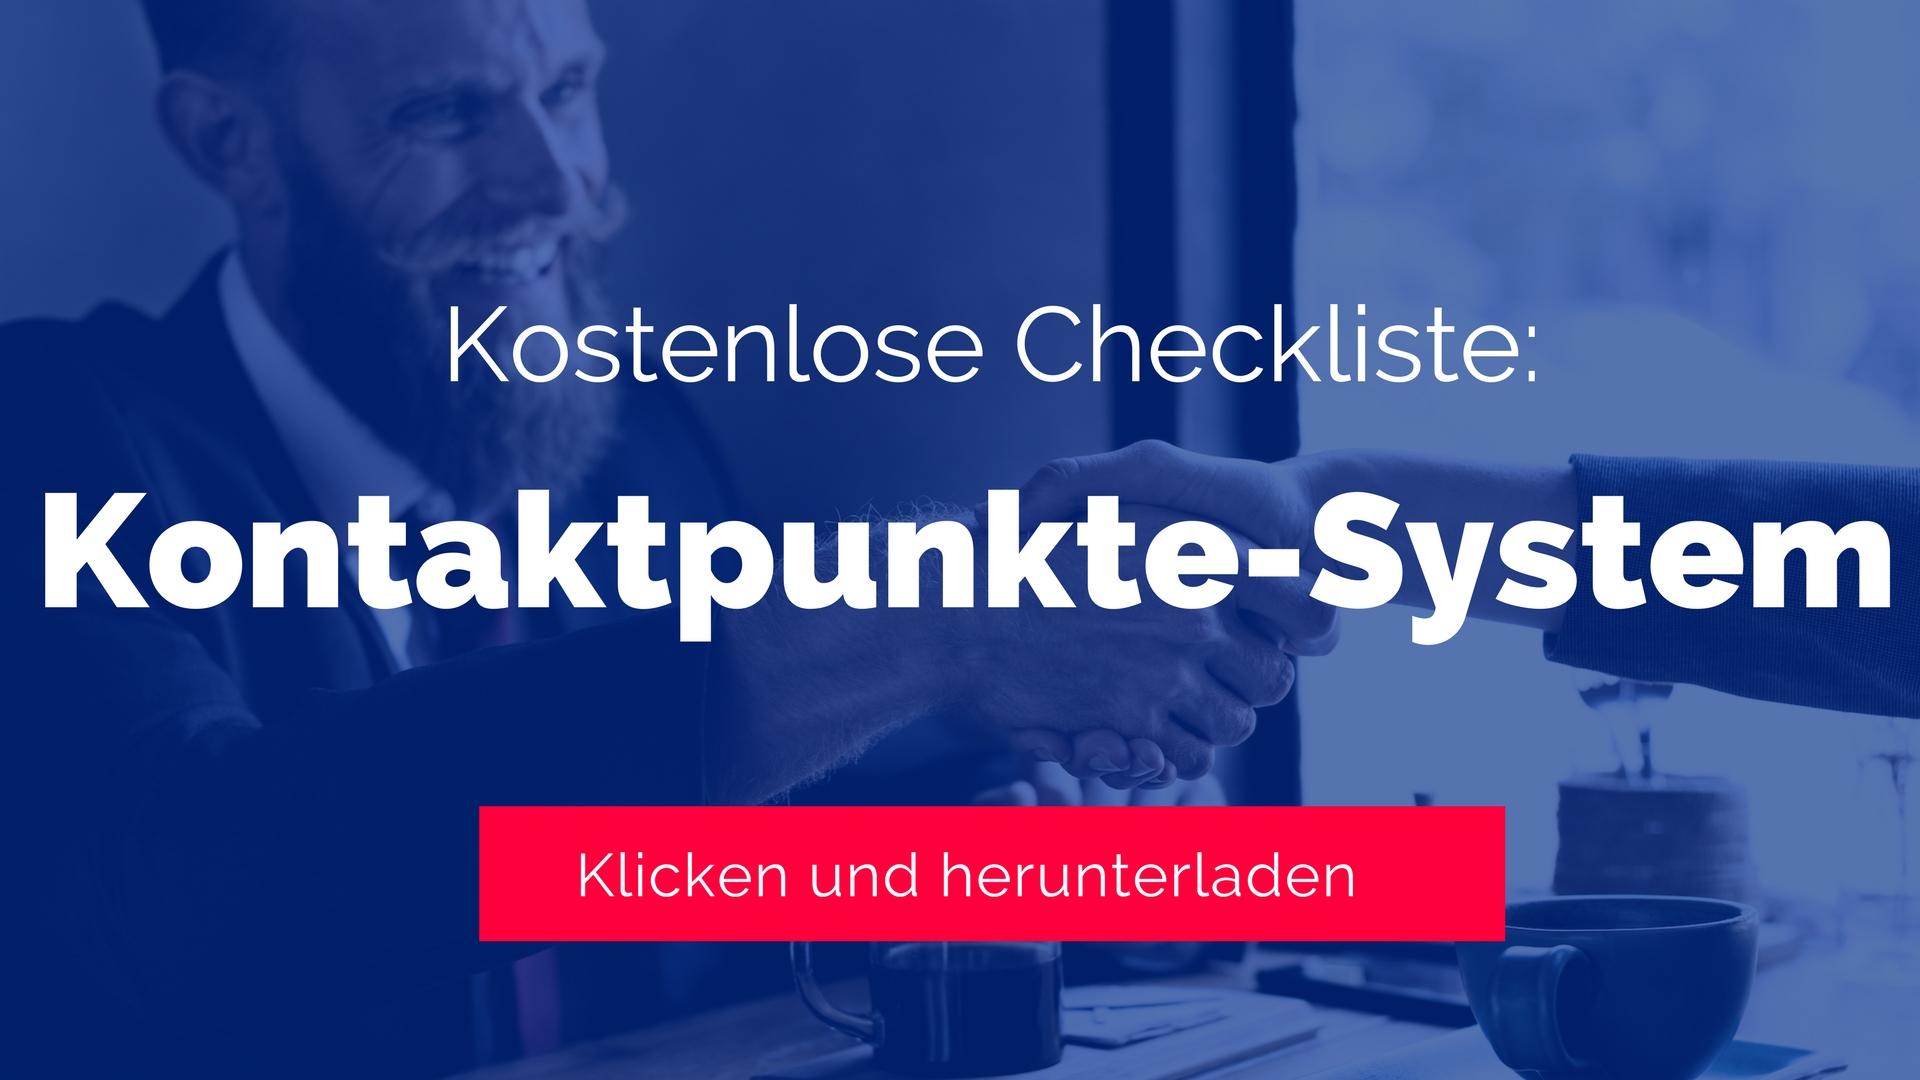 Checkliste Kontaktpunkte-System